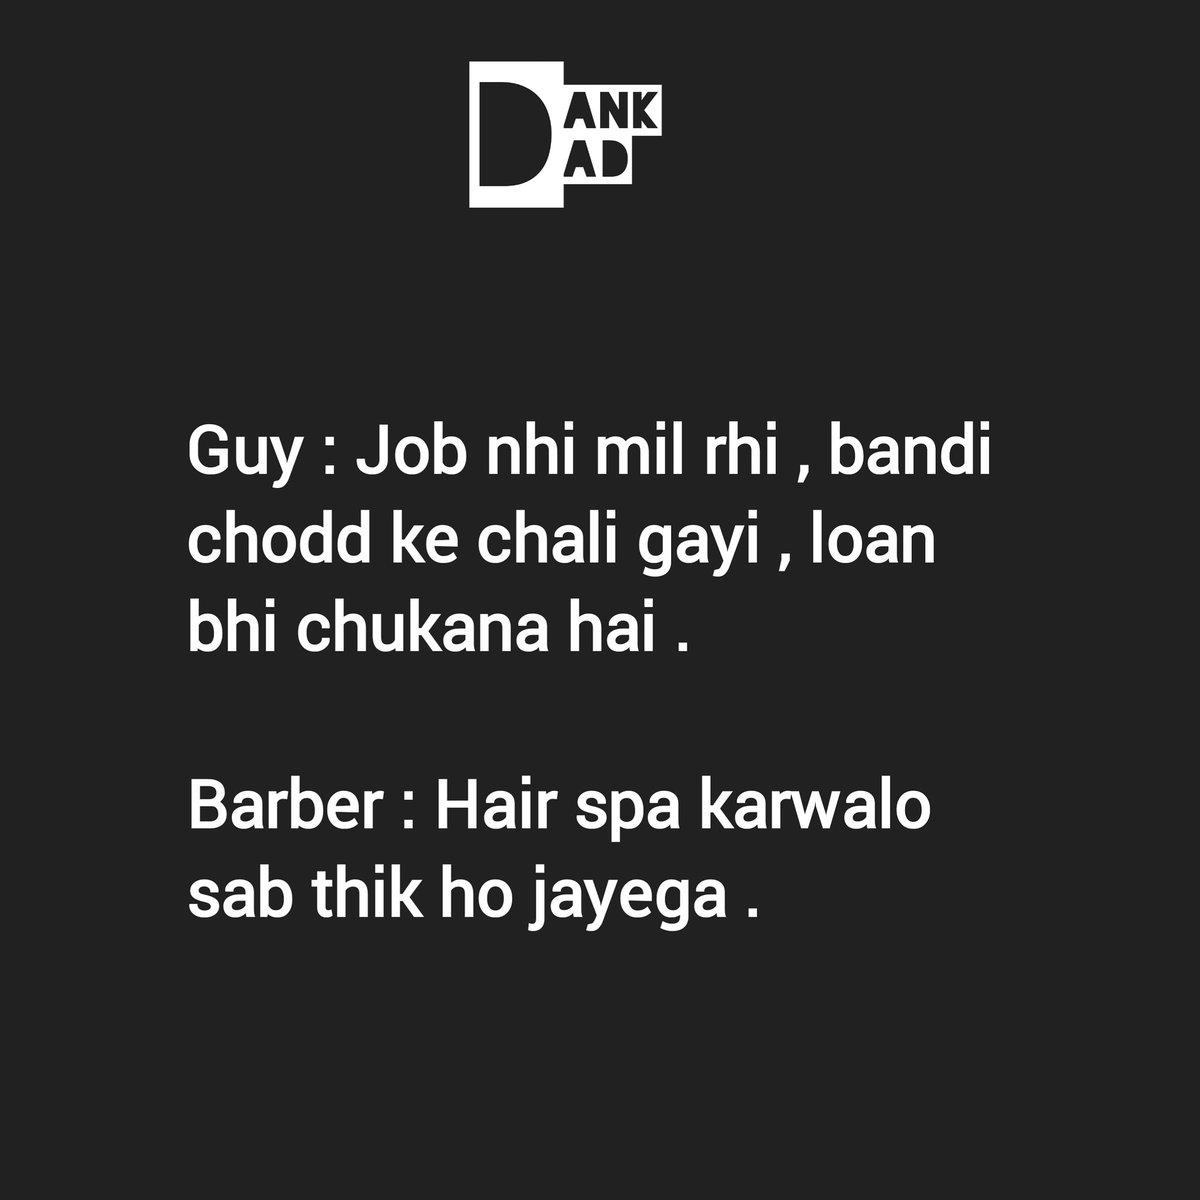 Follow @_dank_dad_ for more ....#fun #jokeoftheday #laugh  #dankjokes #nonvegjokes #follow #funny #jokes #sarcasm #FF #likes #comedyindia #backchodi #sacredmemes #bollywoodpic.twitter.com/7LVONKfKGG